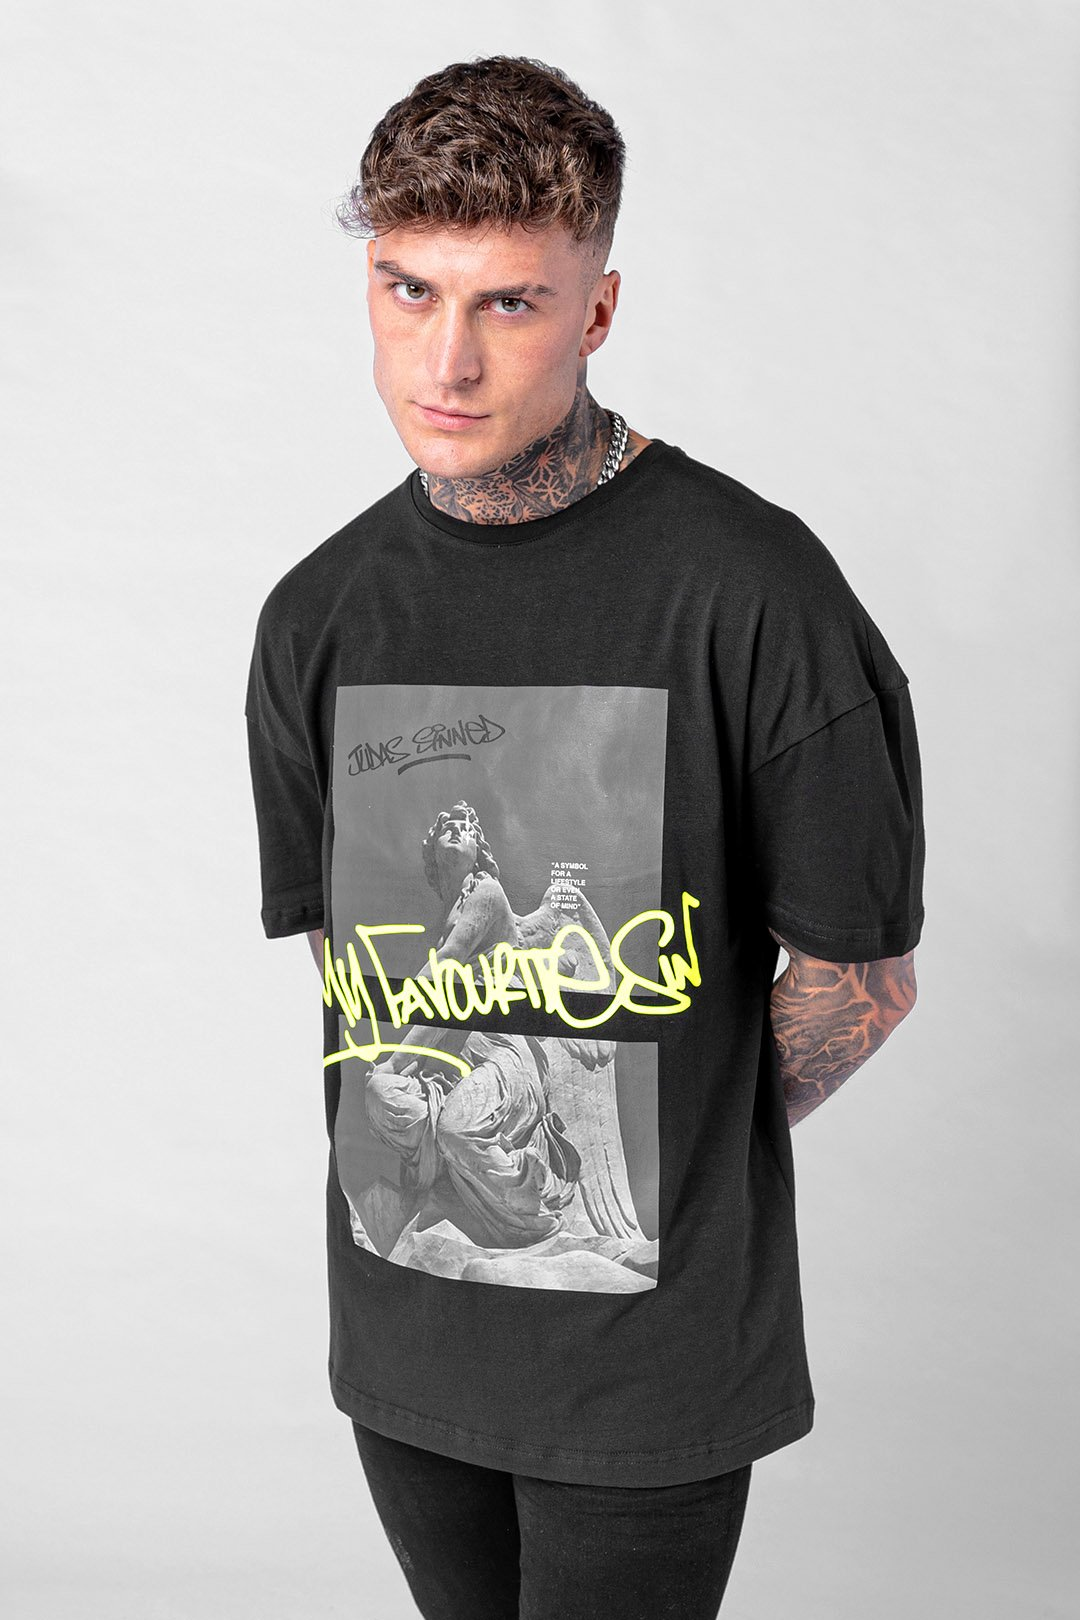 Fave Graffiti Printed Men's T-Shirt - Black, Small